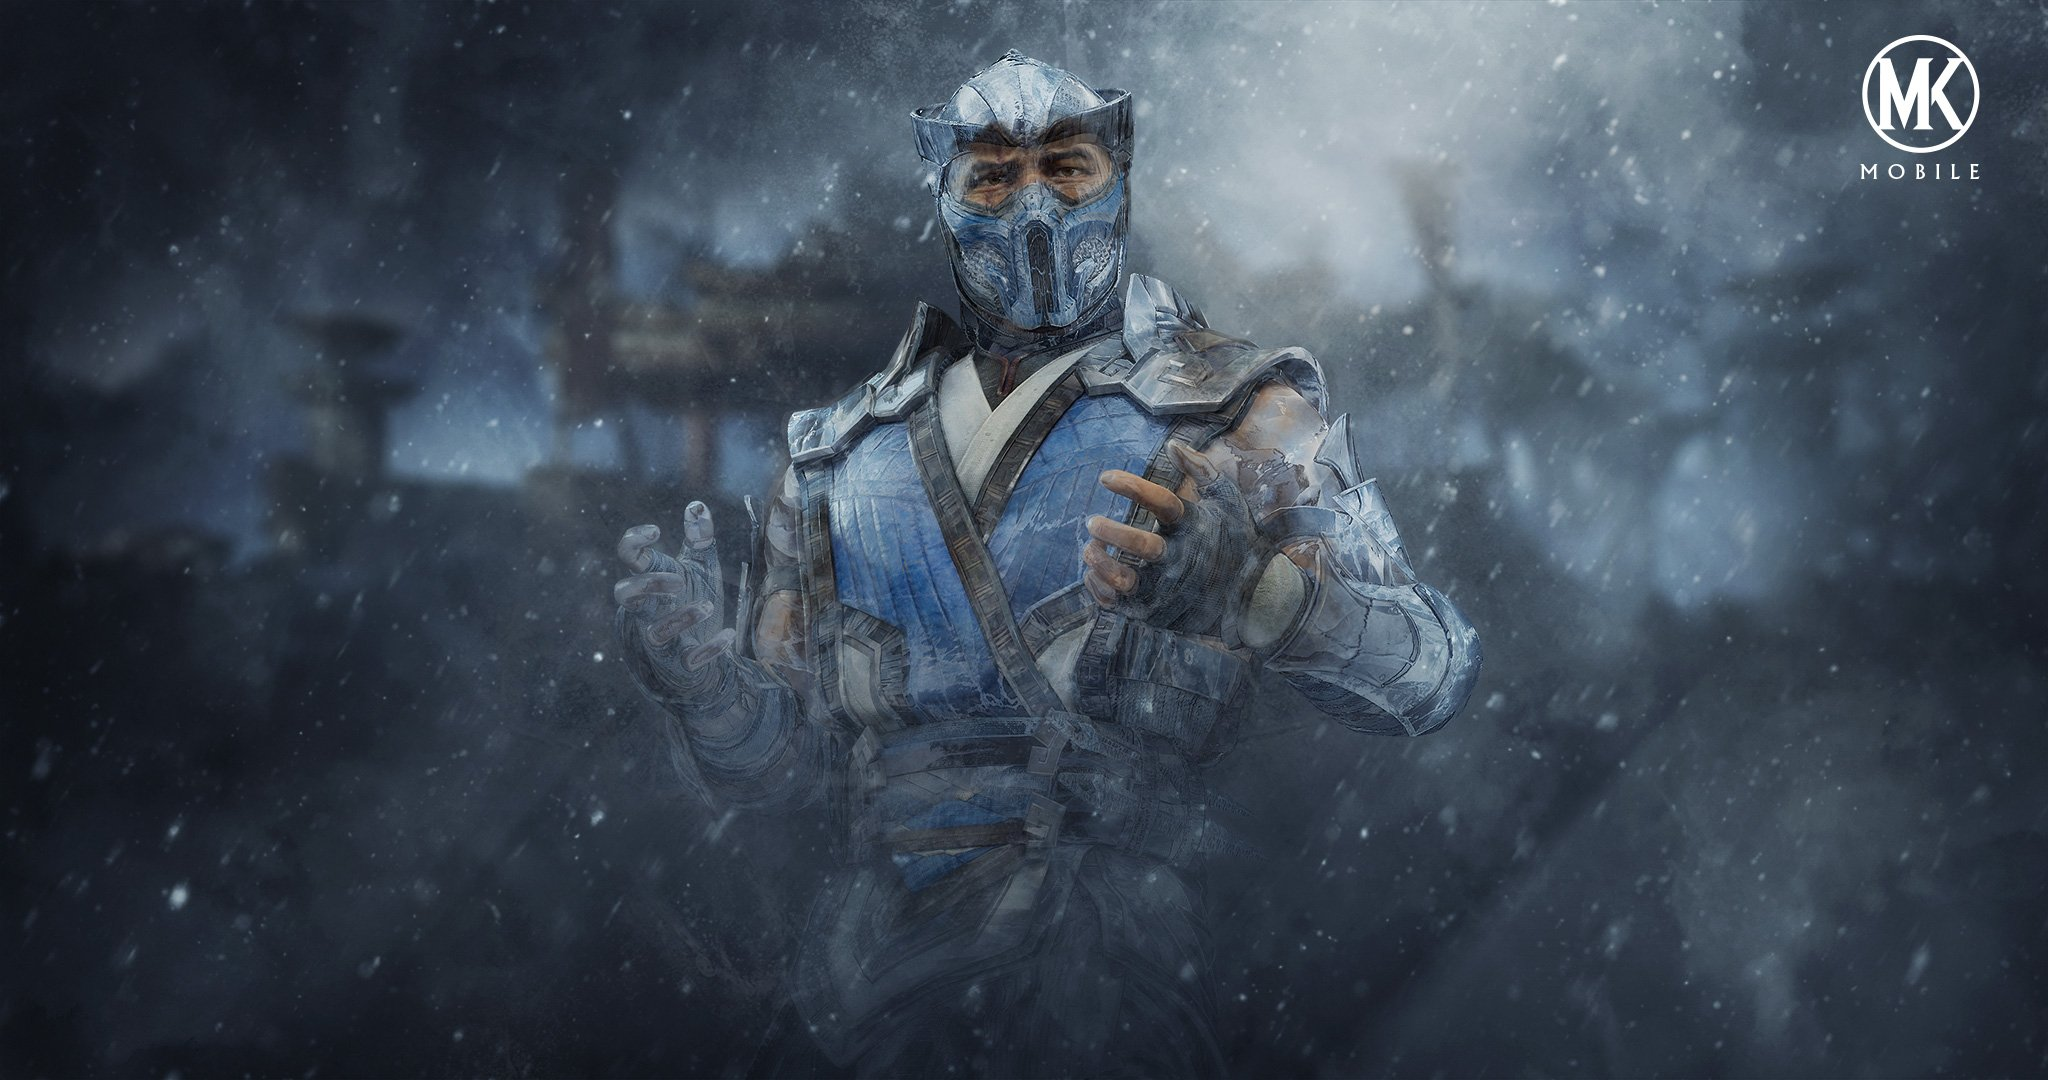 Sub Zero Mortal Kombat Games Fan Site